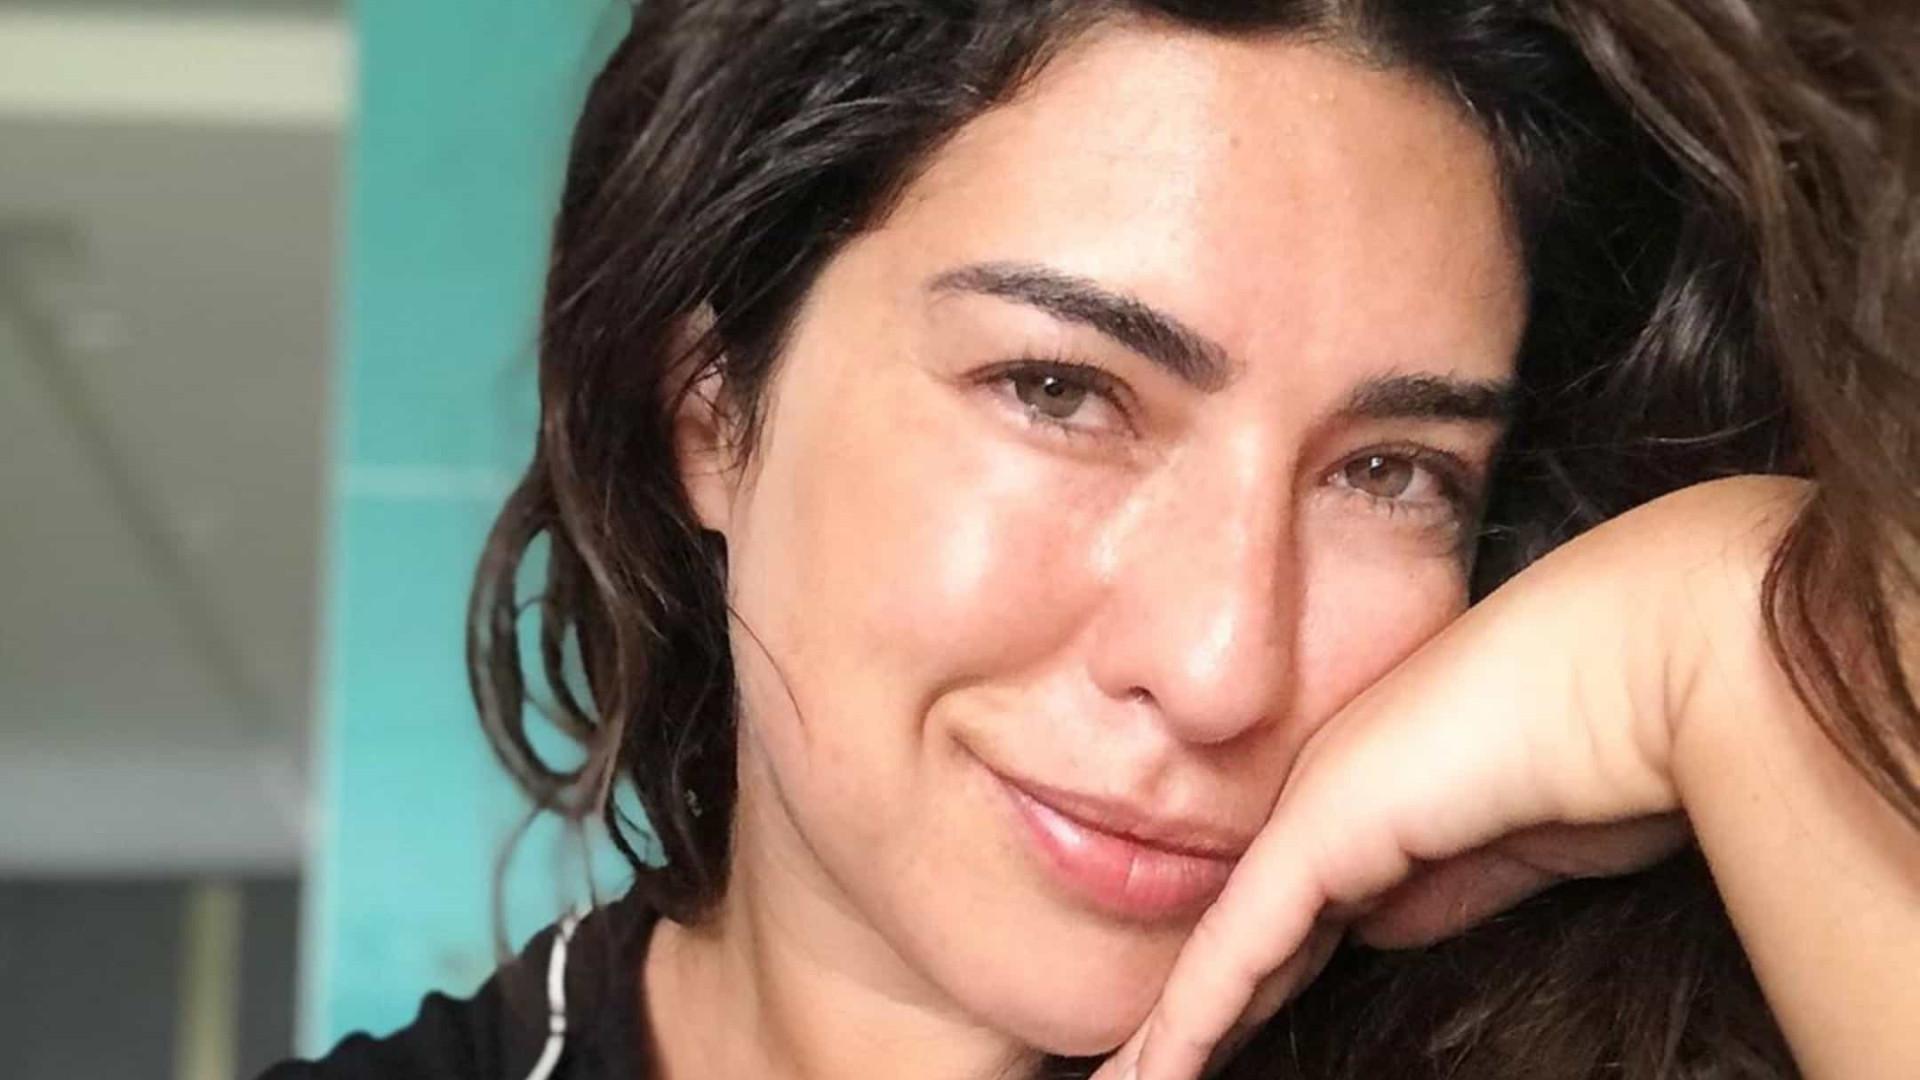 Fernanda Paes Leme comemora alta médica após ter contraído Covid-19